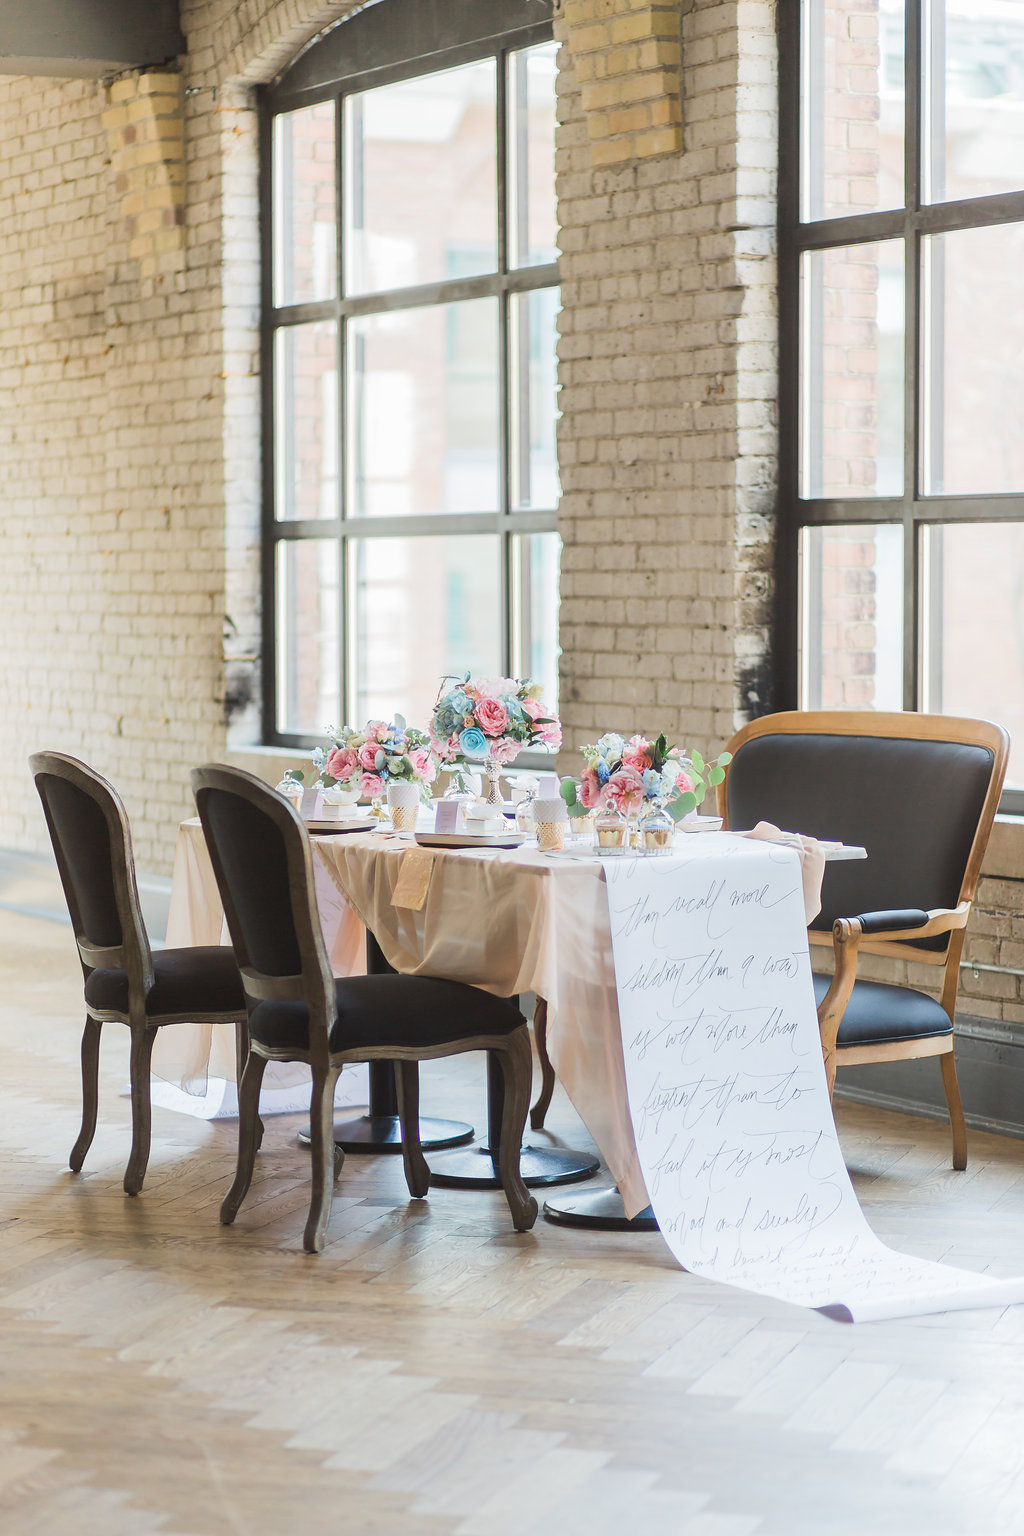 Phoebe Lo Events Toronto Wedding - Storys Building Urban Loft Paper Inspired Wedding 018.jpg